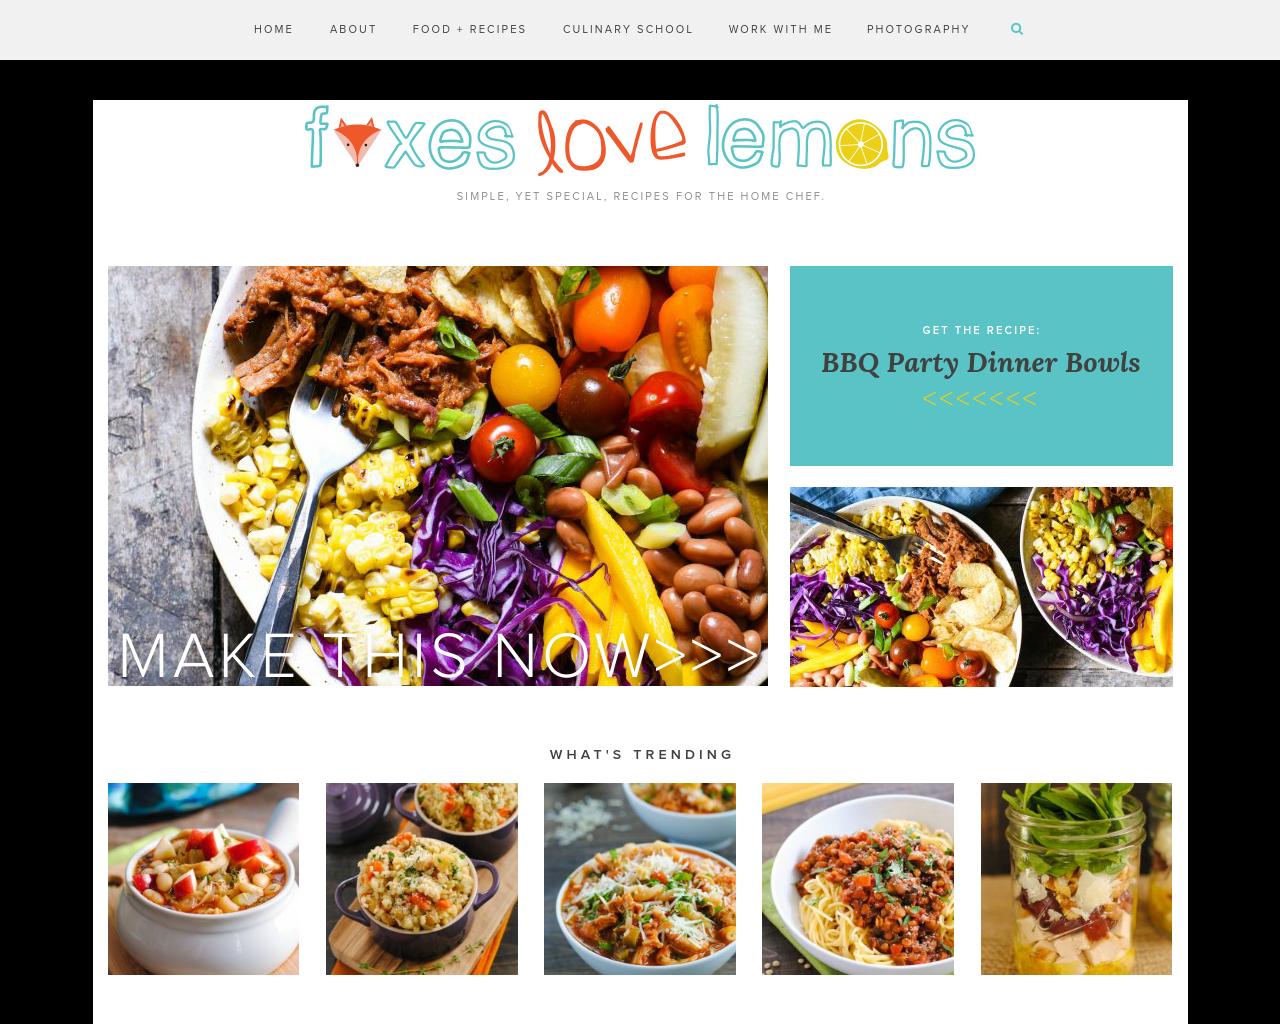 Foxes-Love-Lemons-Advertising-Reviews-Pricing